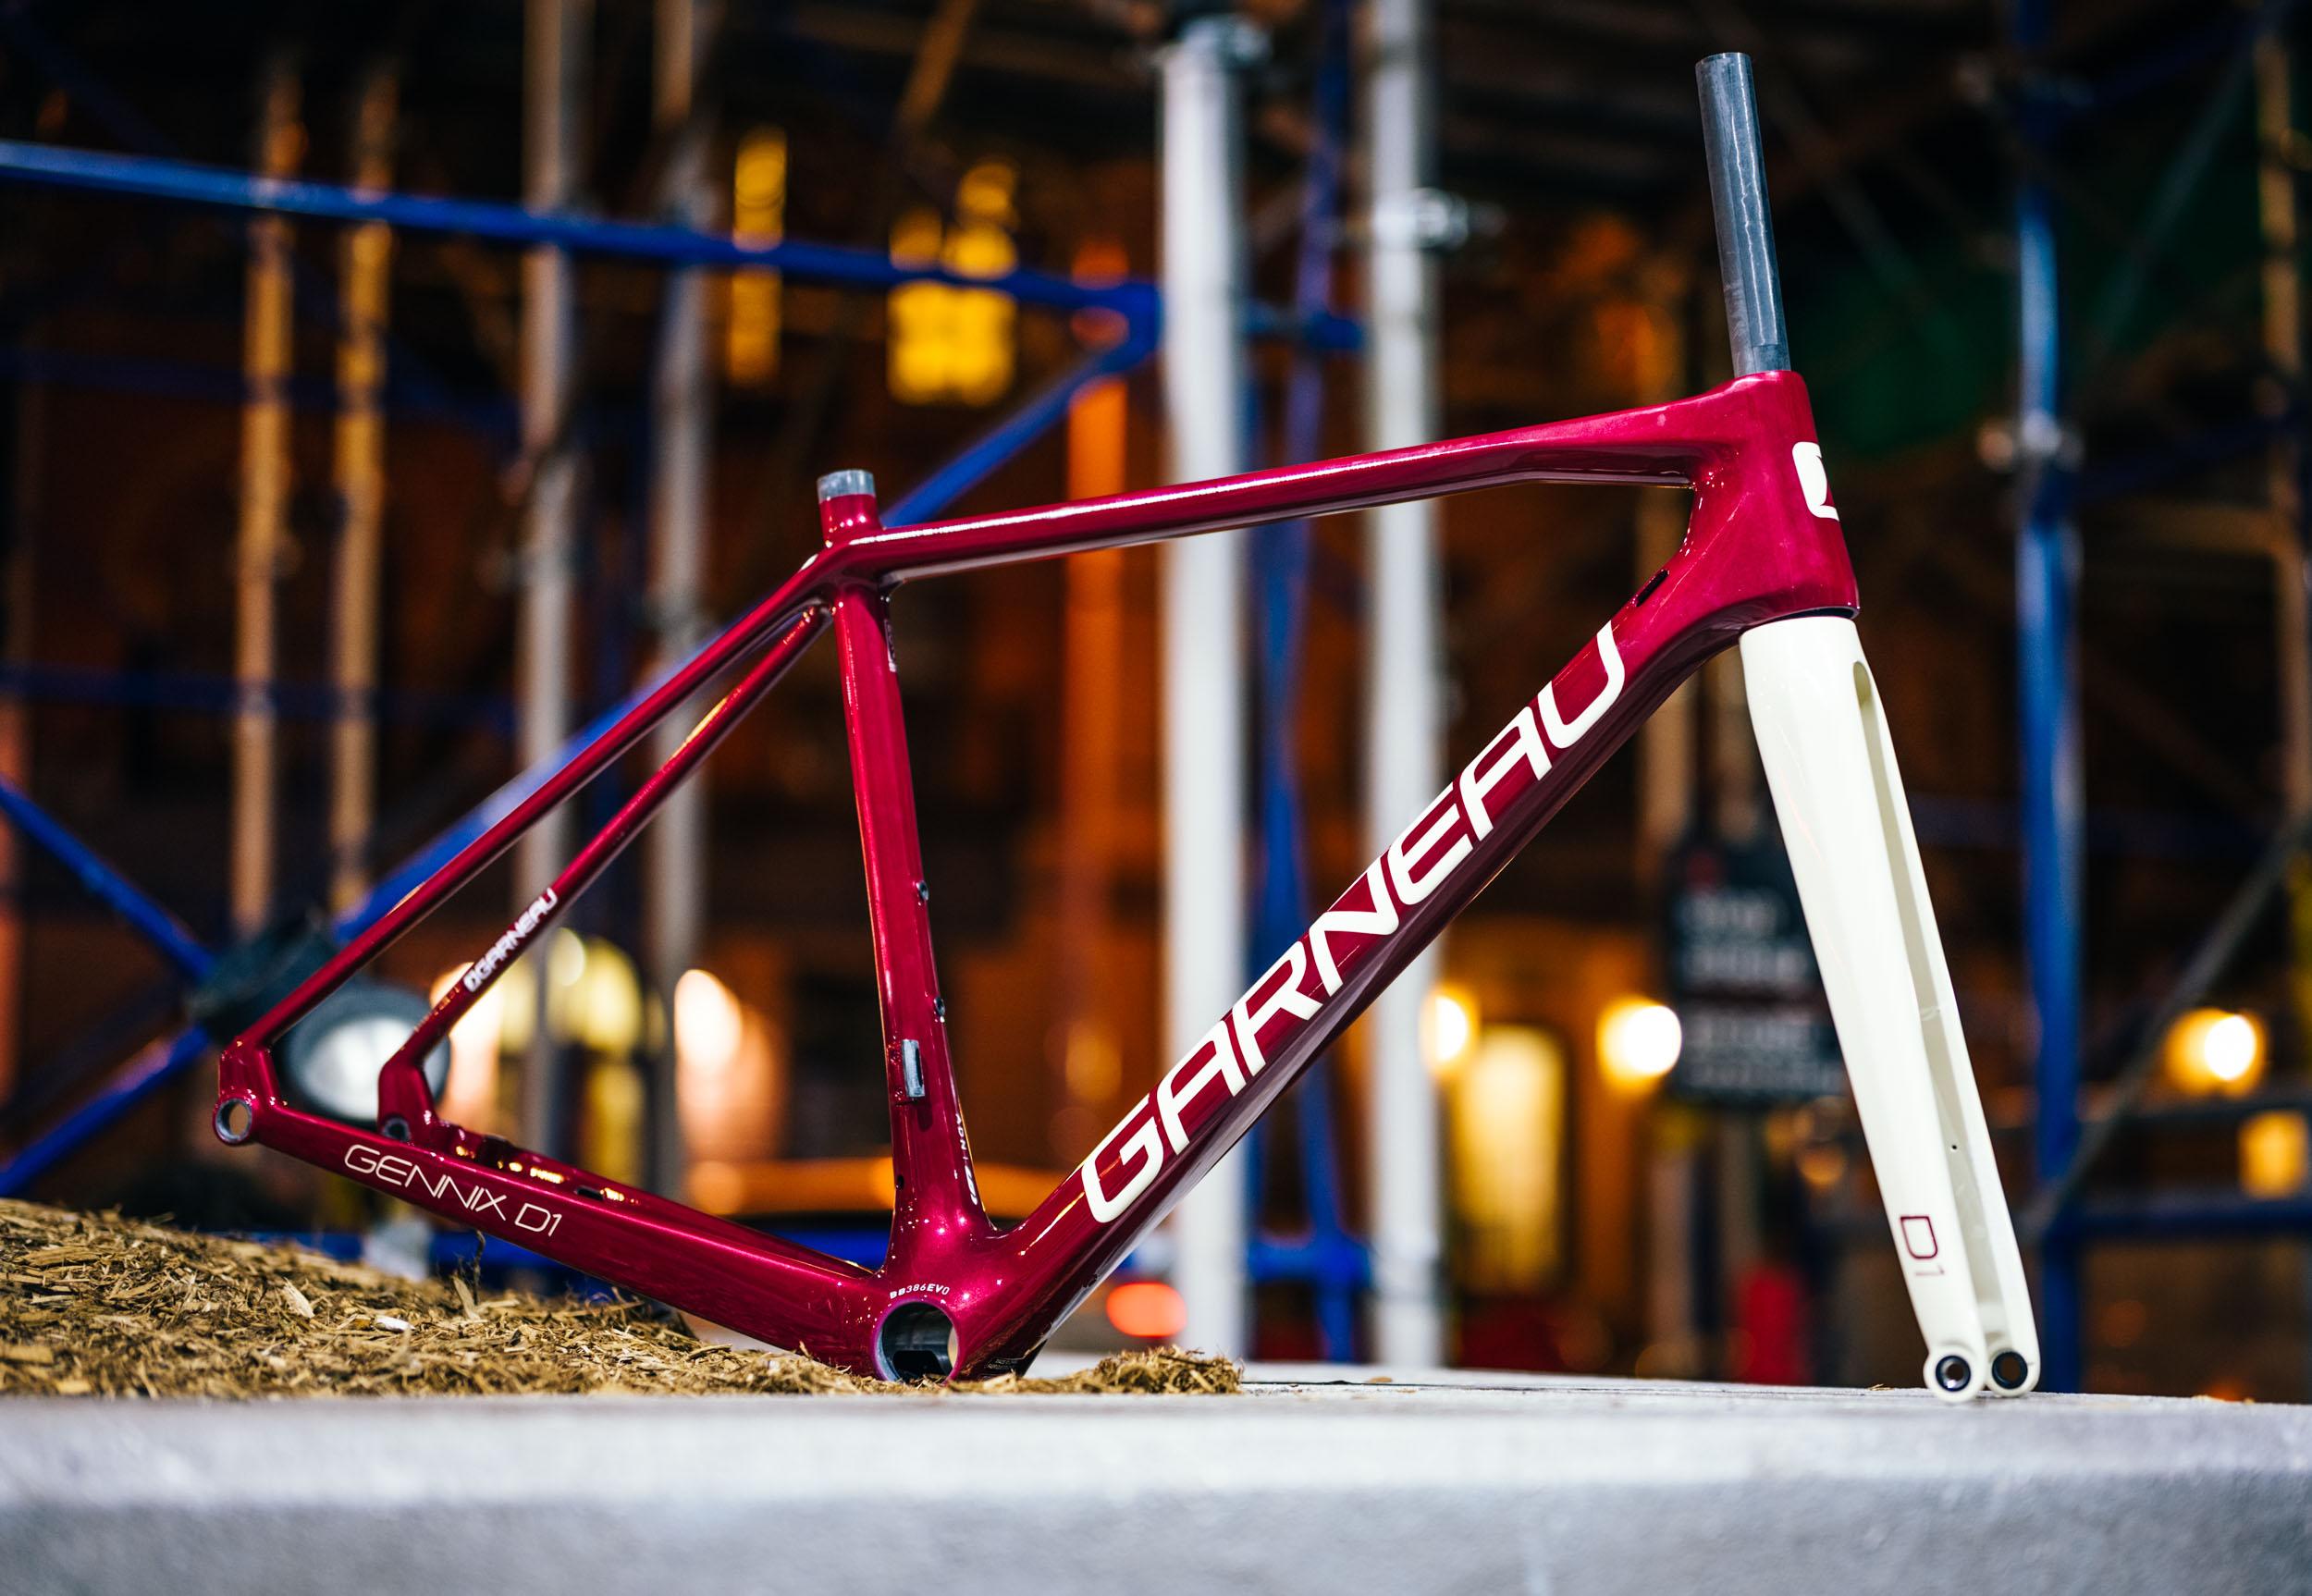 to-be-determined-photo-rhetoric-garneau-team-bikes-103.jpg